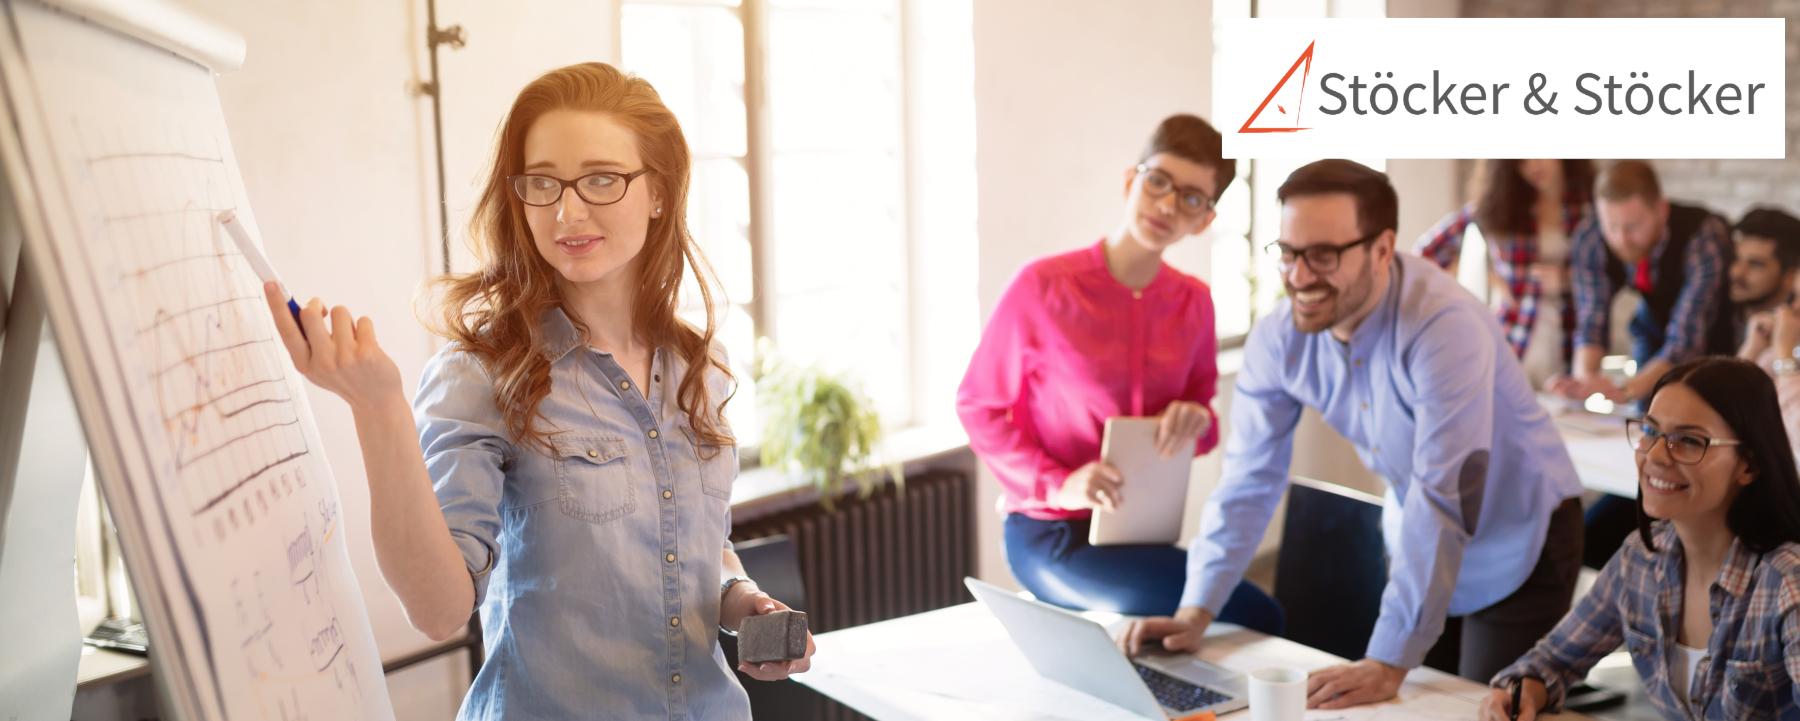 Students College University Education attending lecture , workshop concept